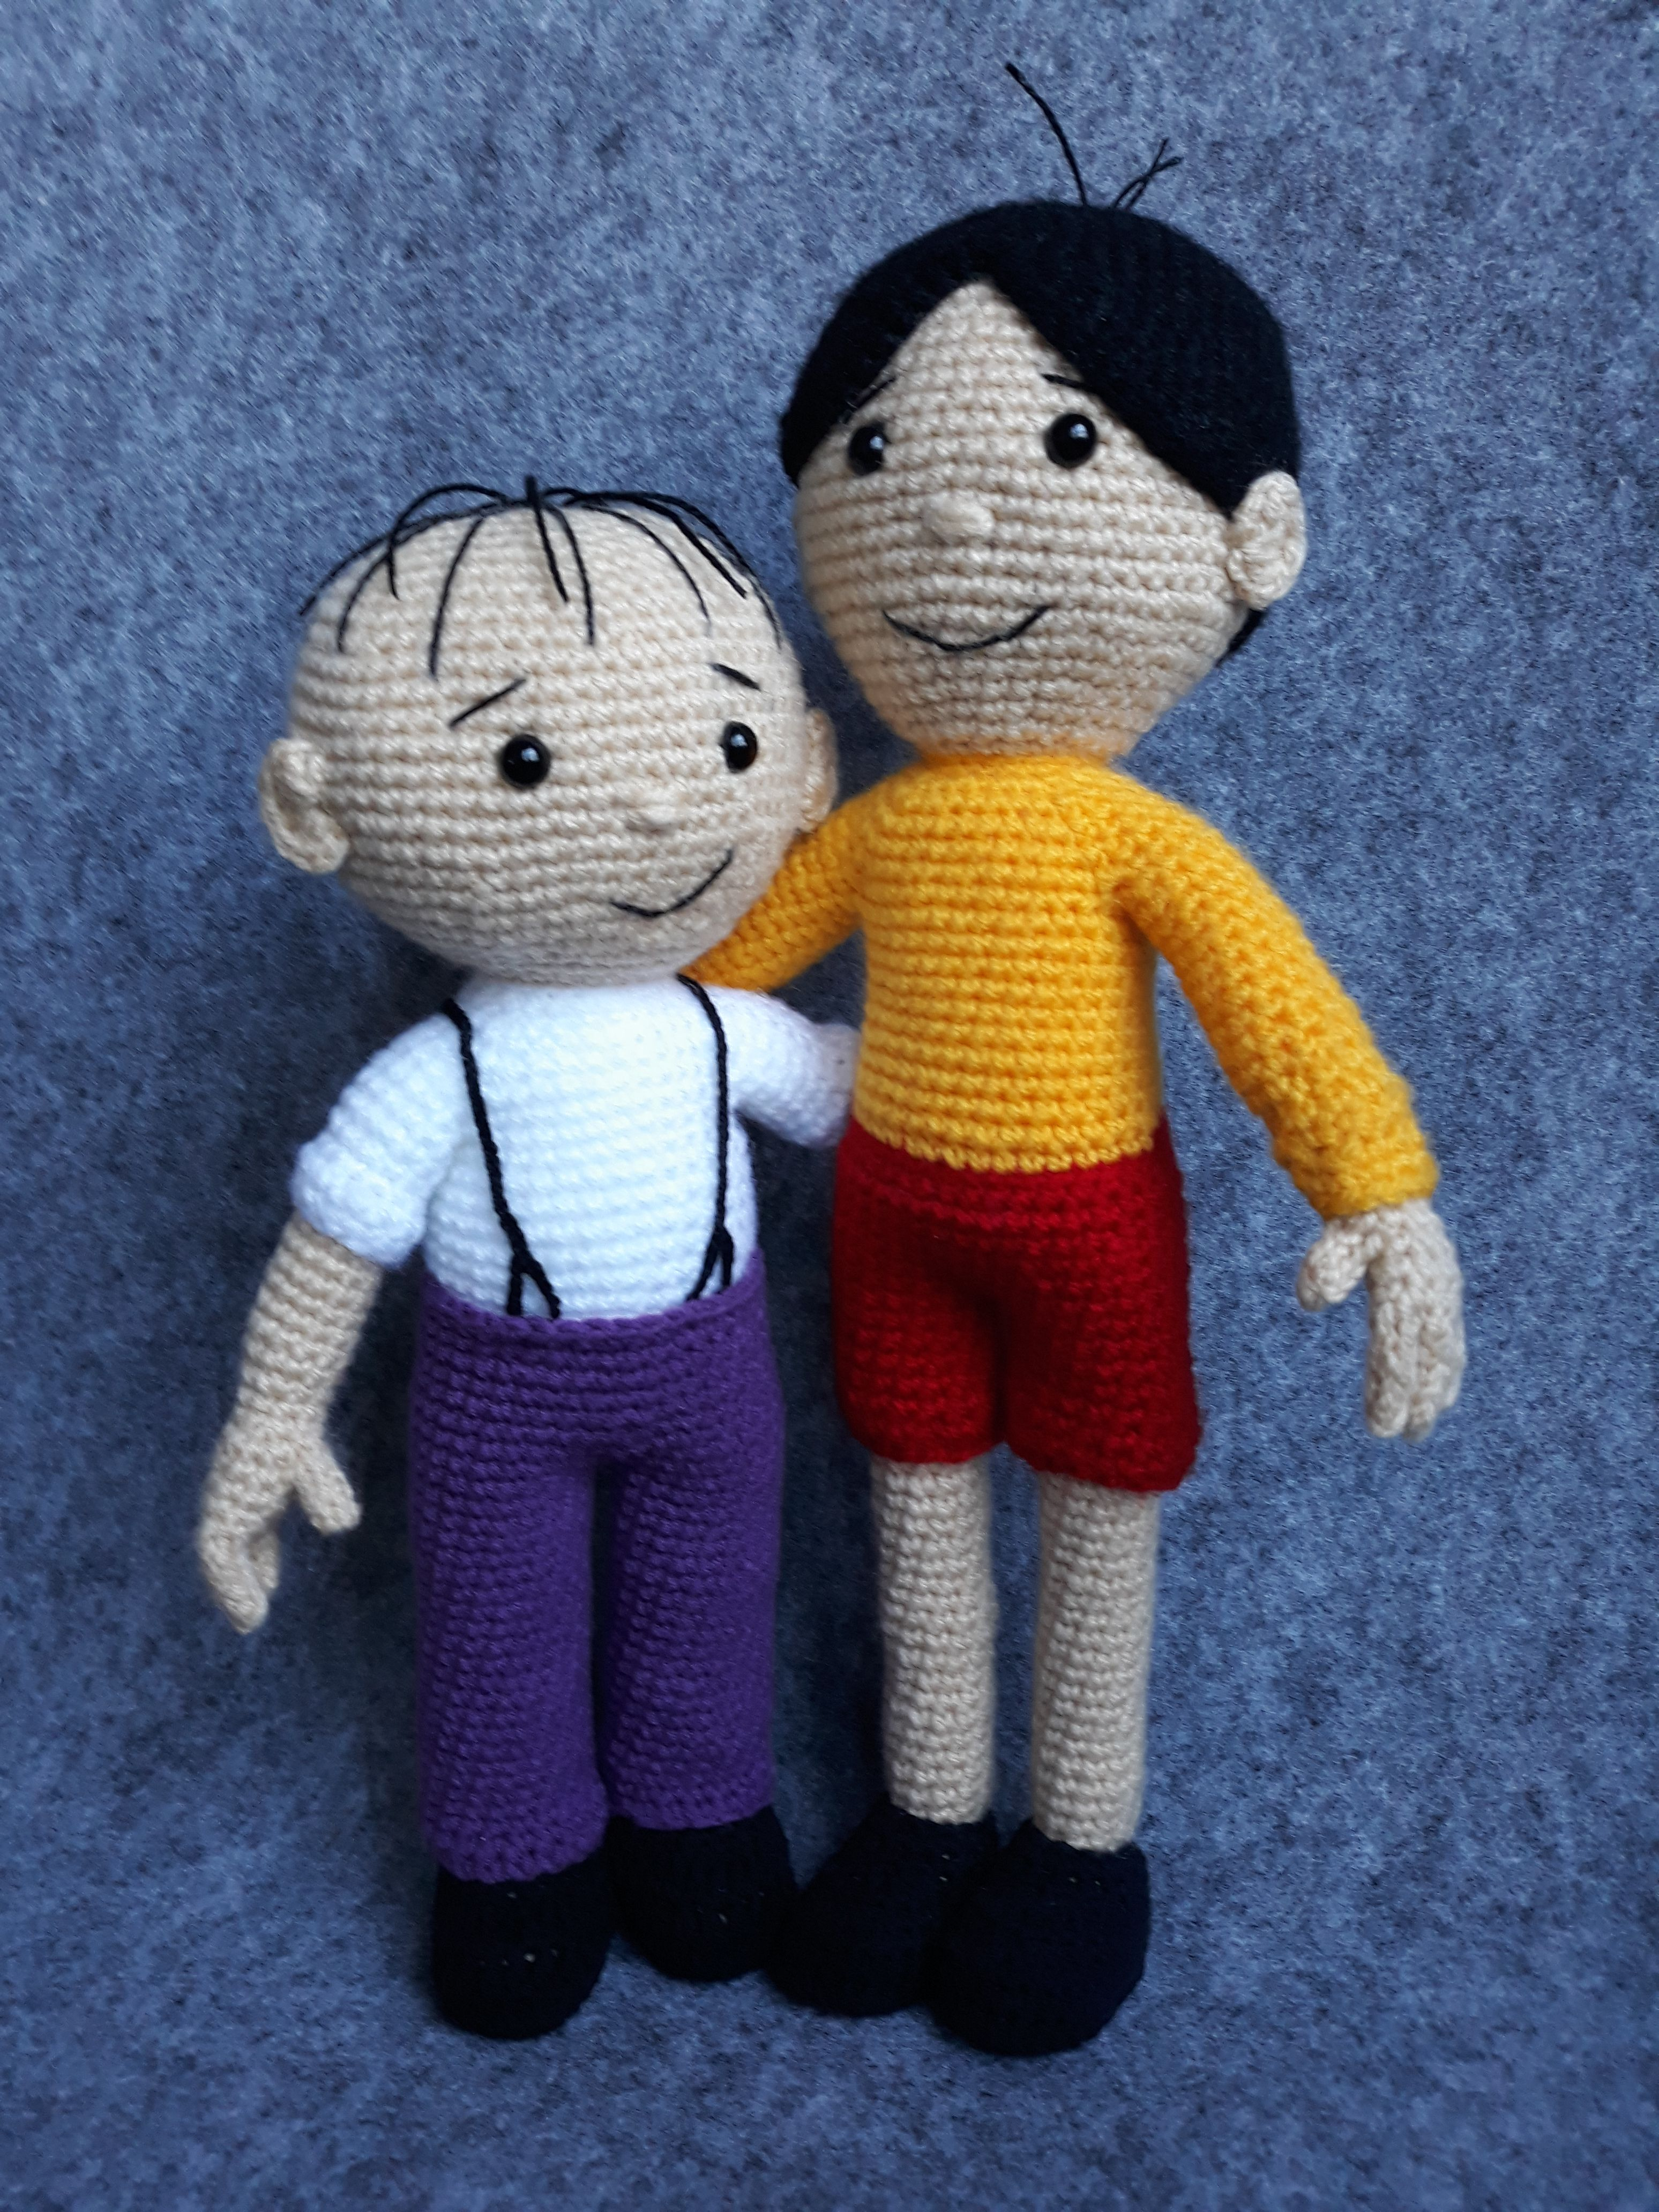 Toy house crochet. The work of Elena Aistova